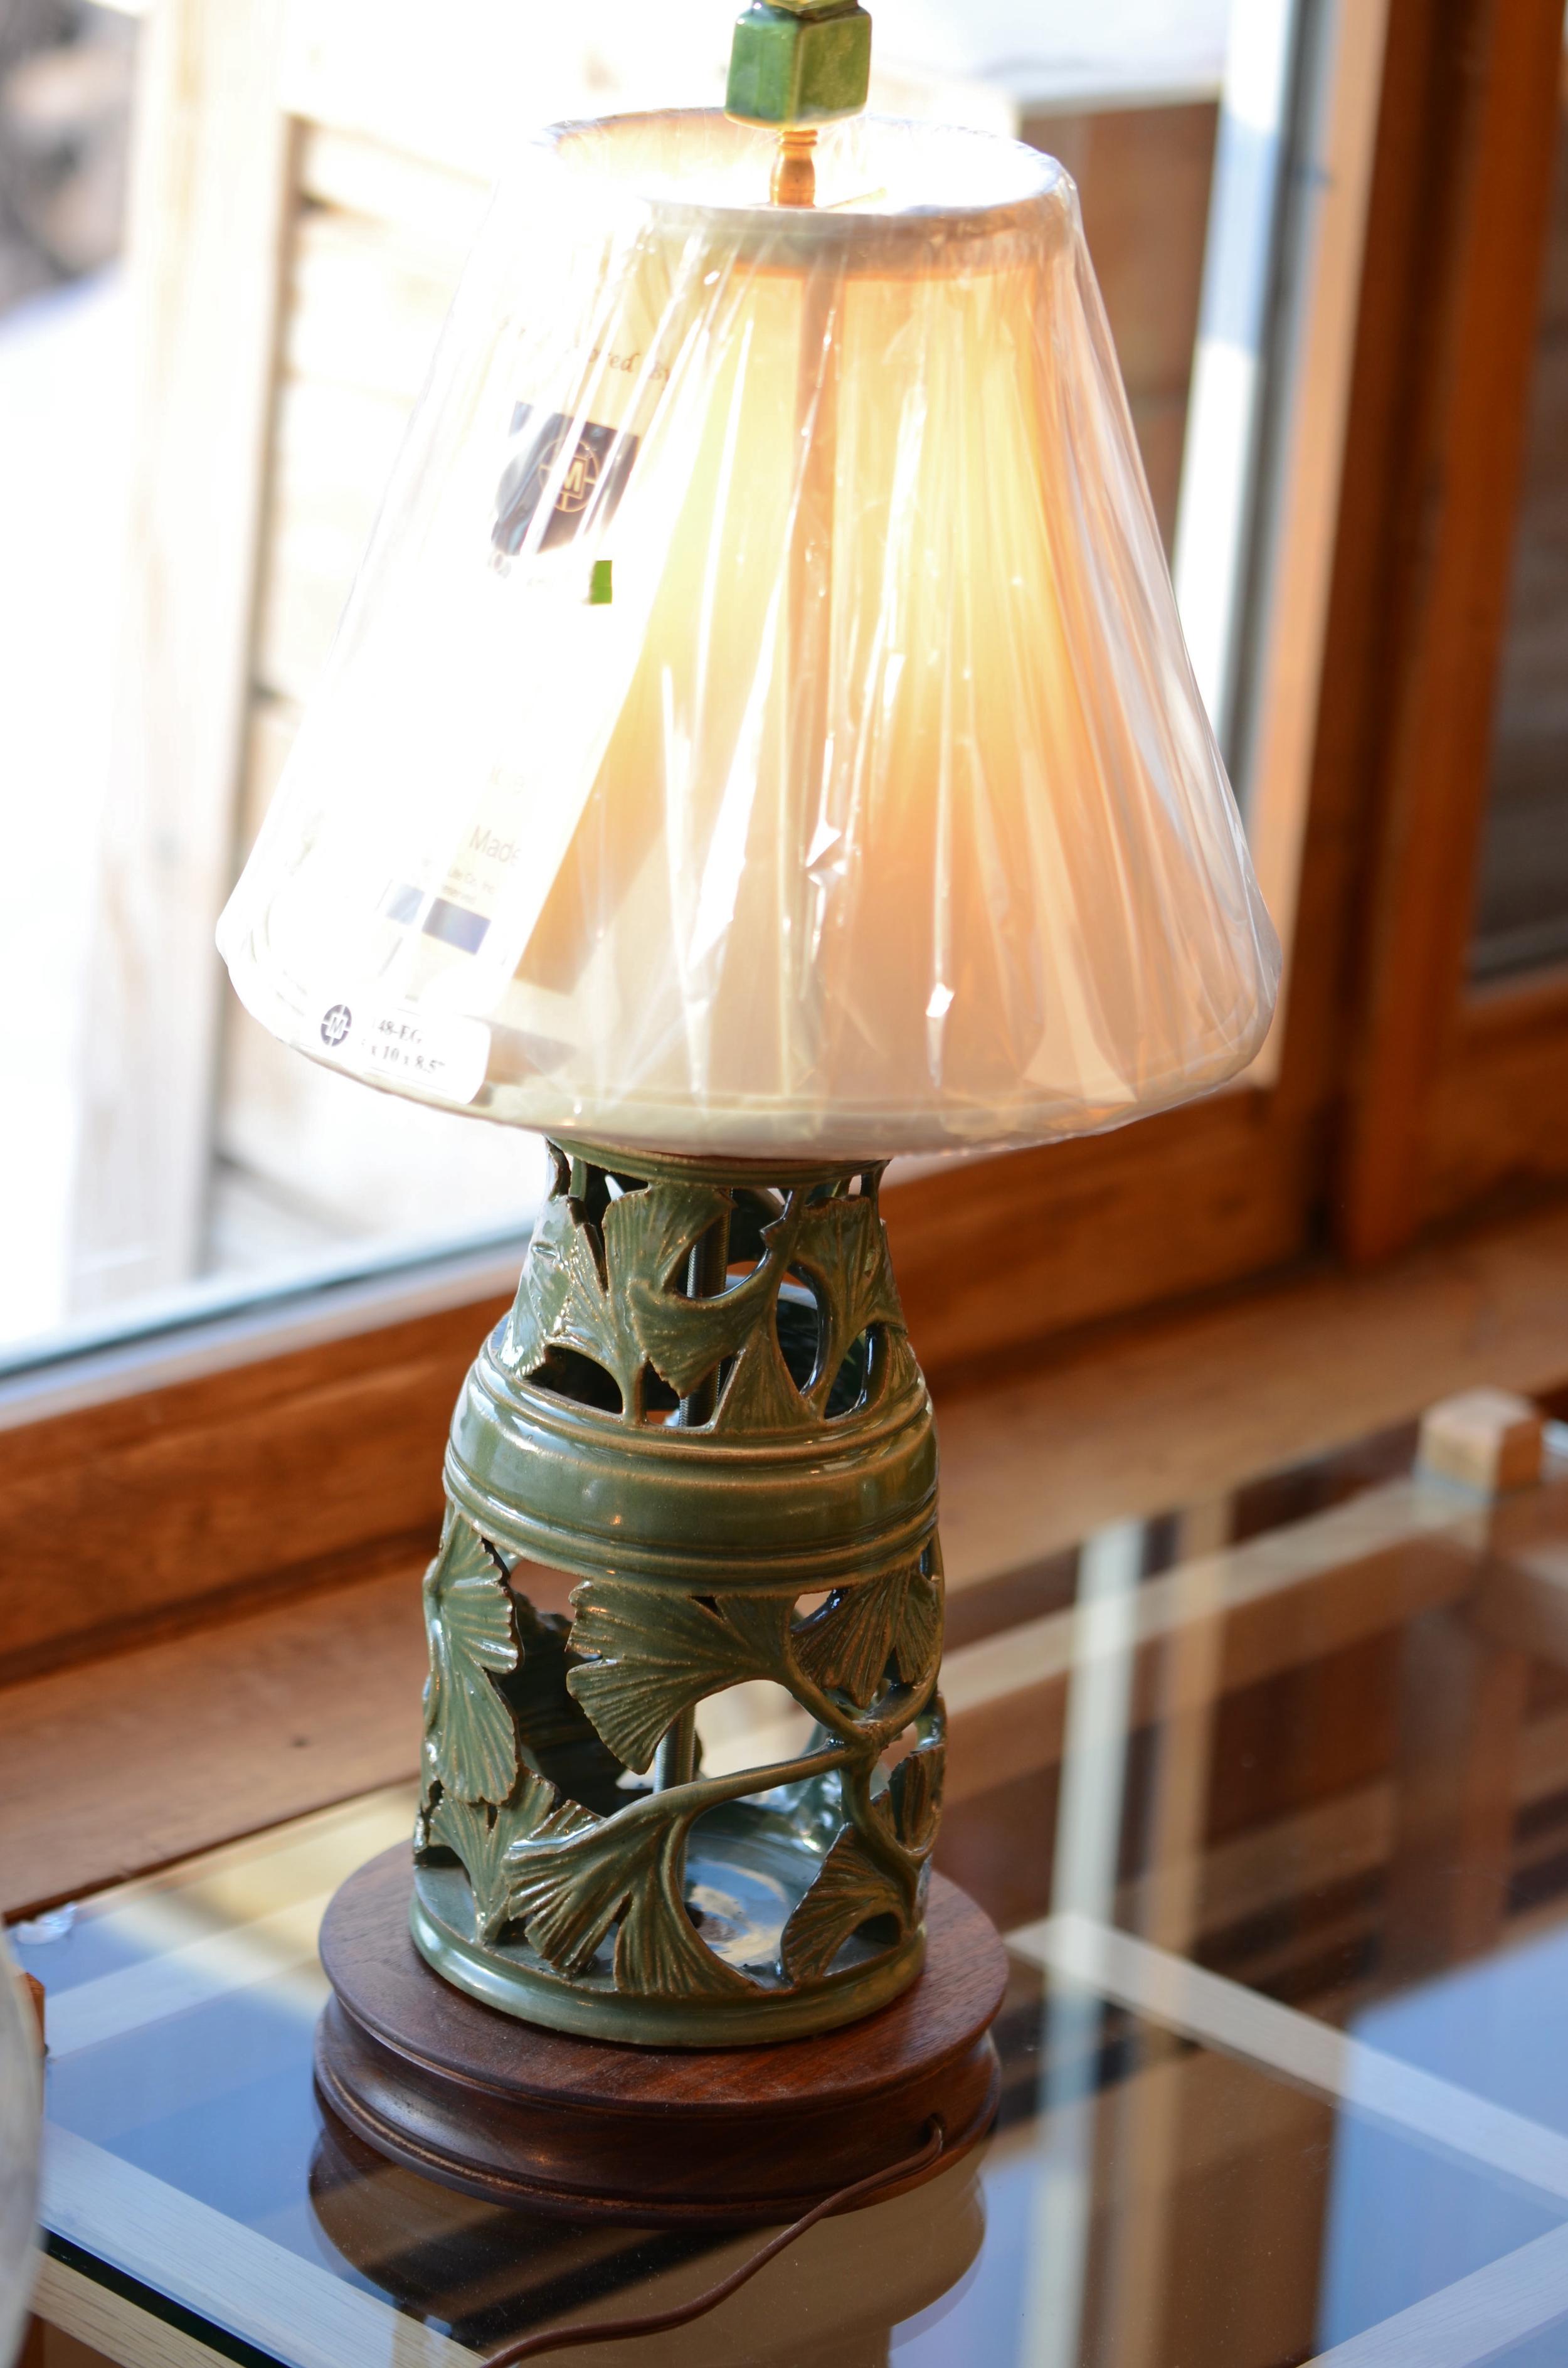 Ginko lamp. Photo by Karen Kopacz.